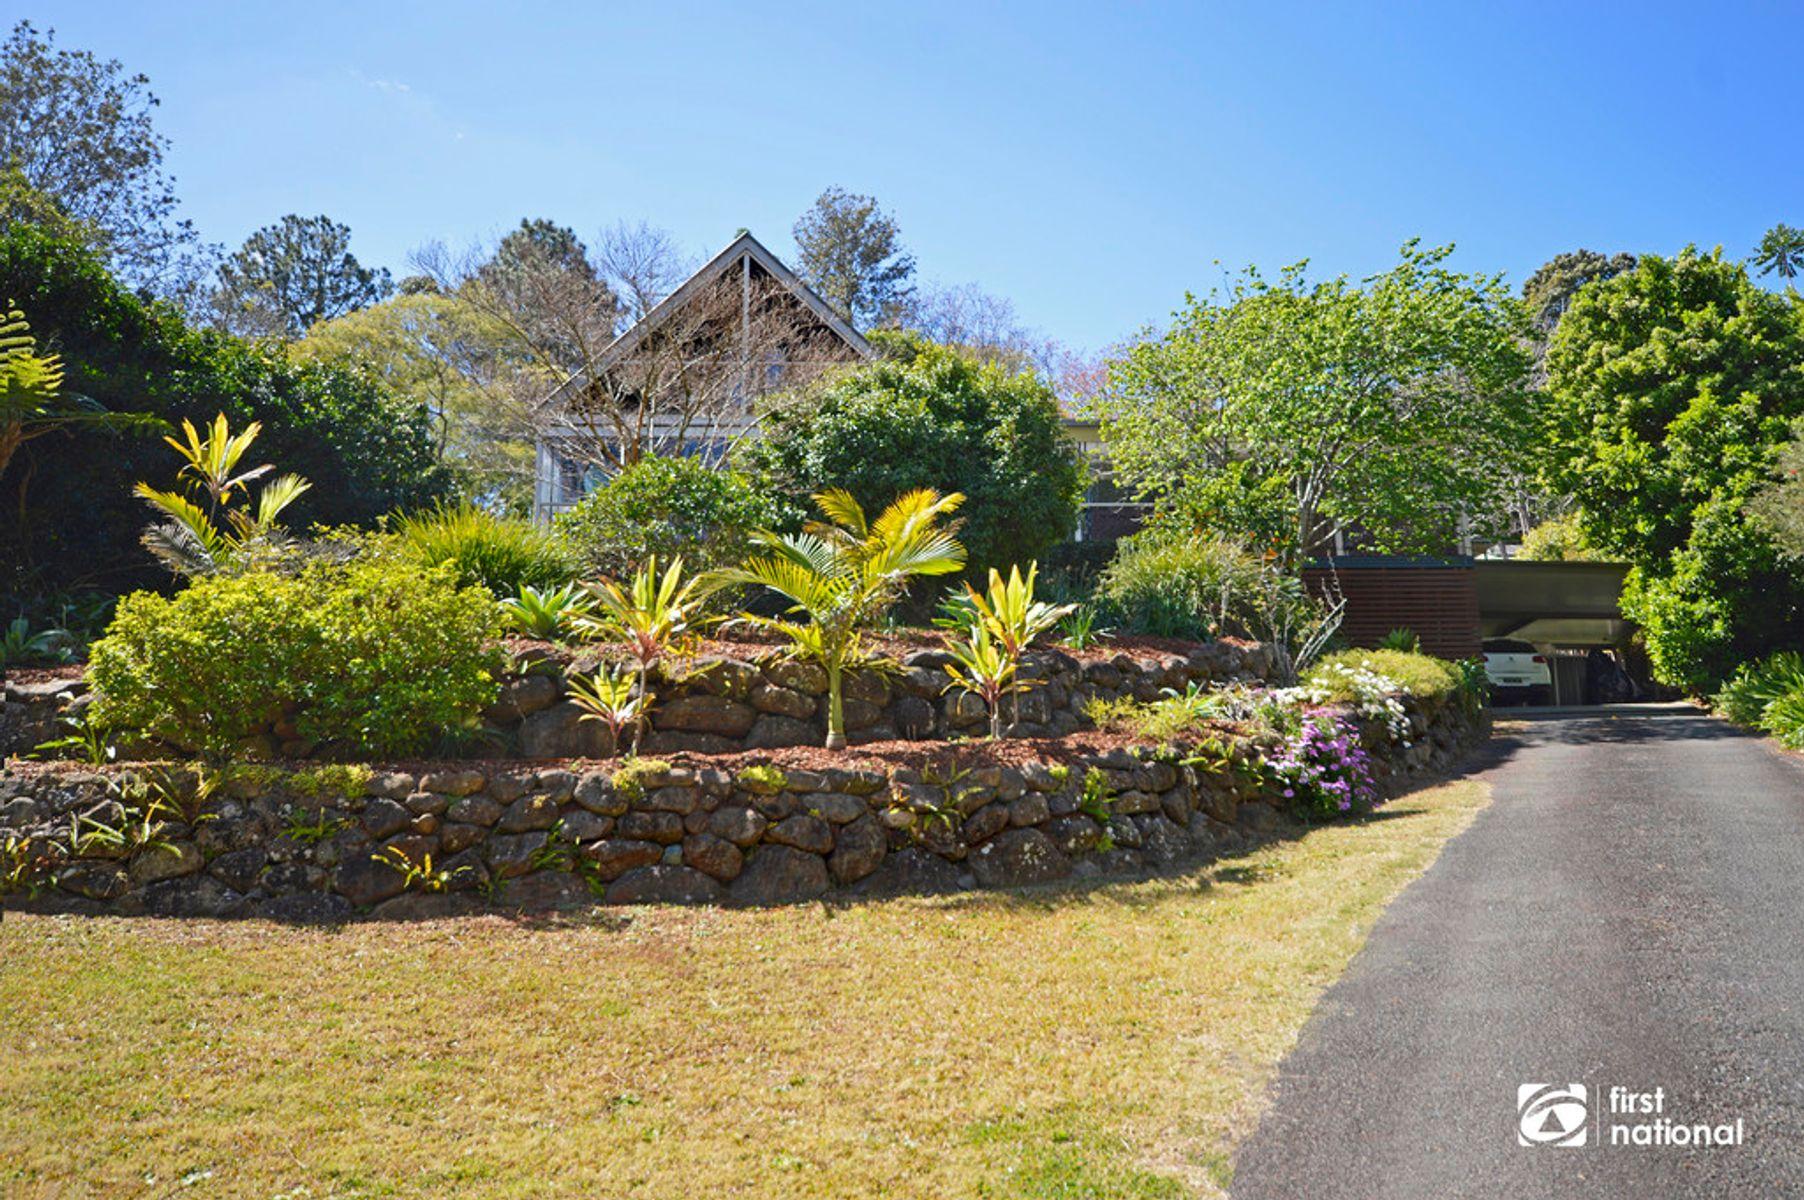 12 Meron Court, Tamborine Mountain, QLD 4272